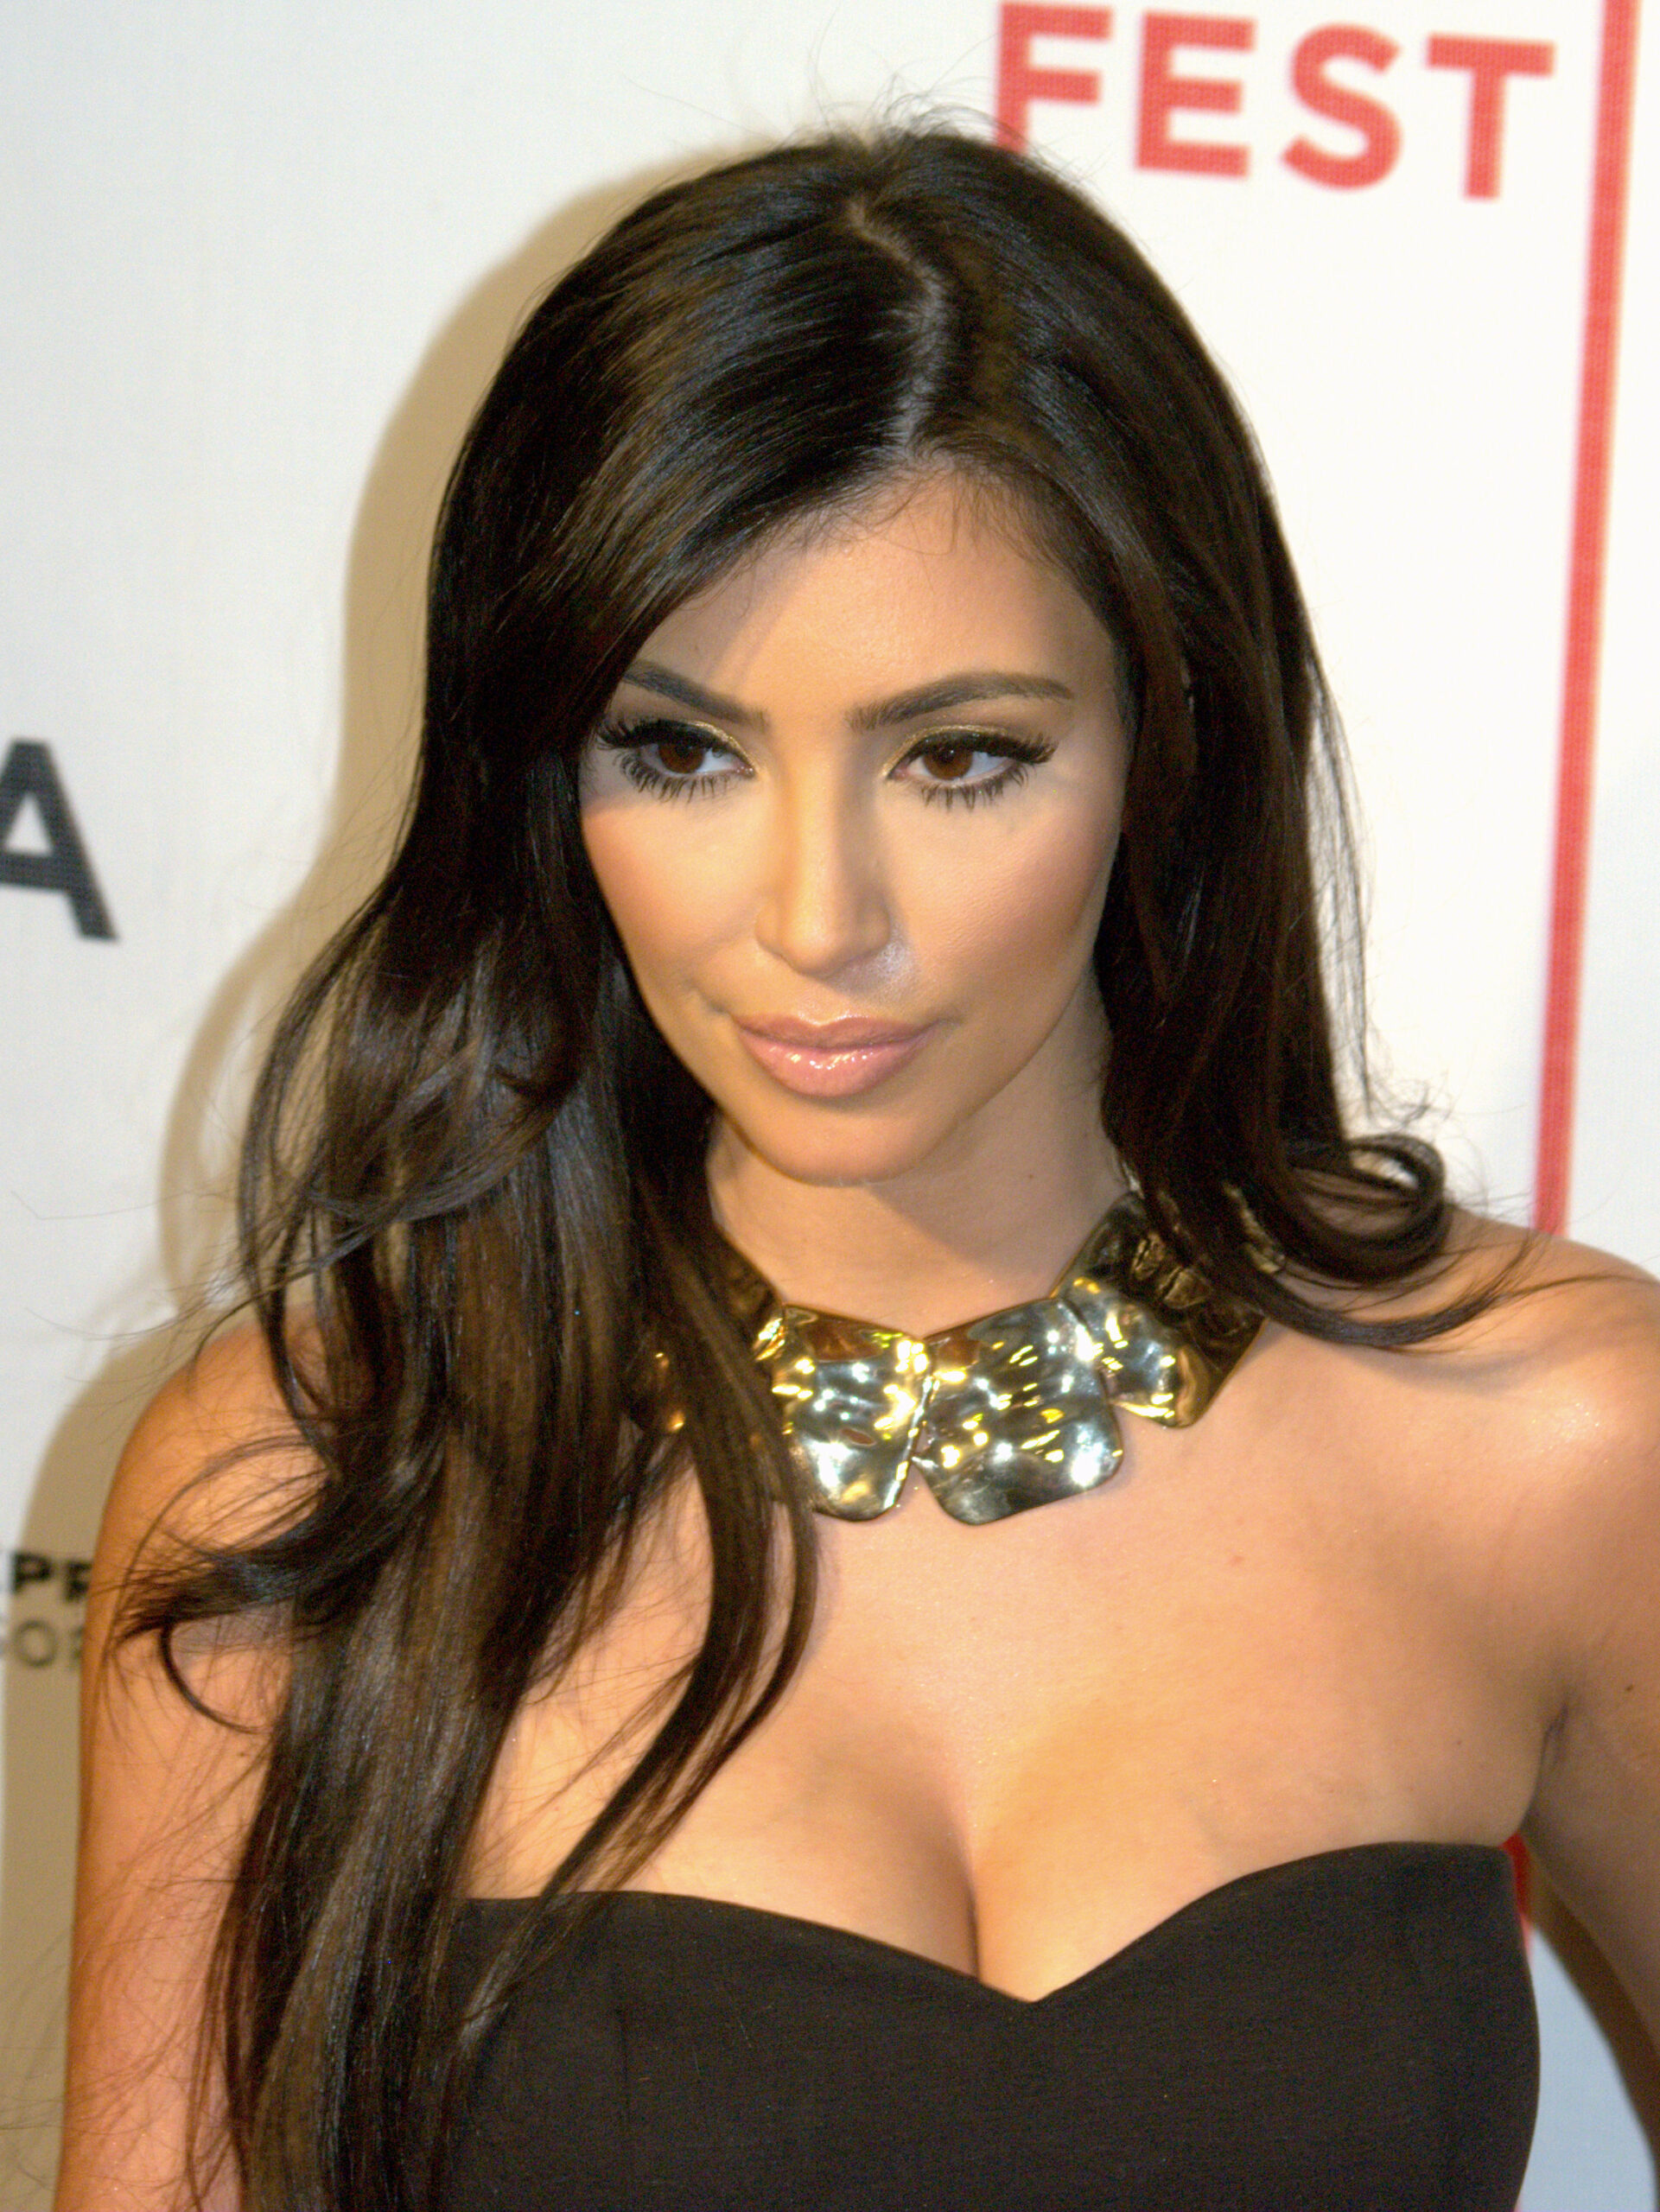 Fotografiile pe care Kim Kardashian le vrea disparute! Adevarul a iesit la suprafata